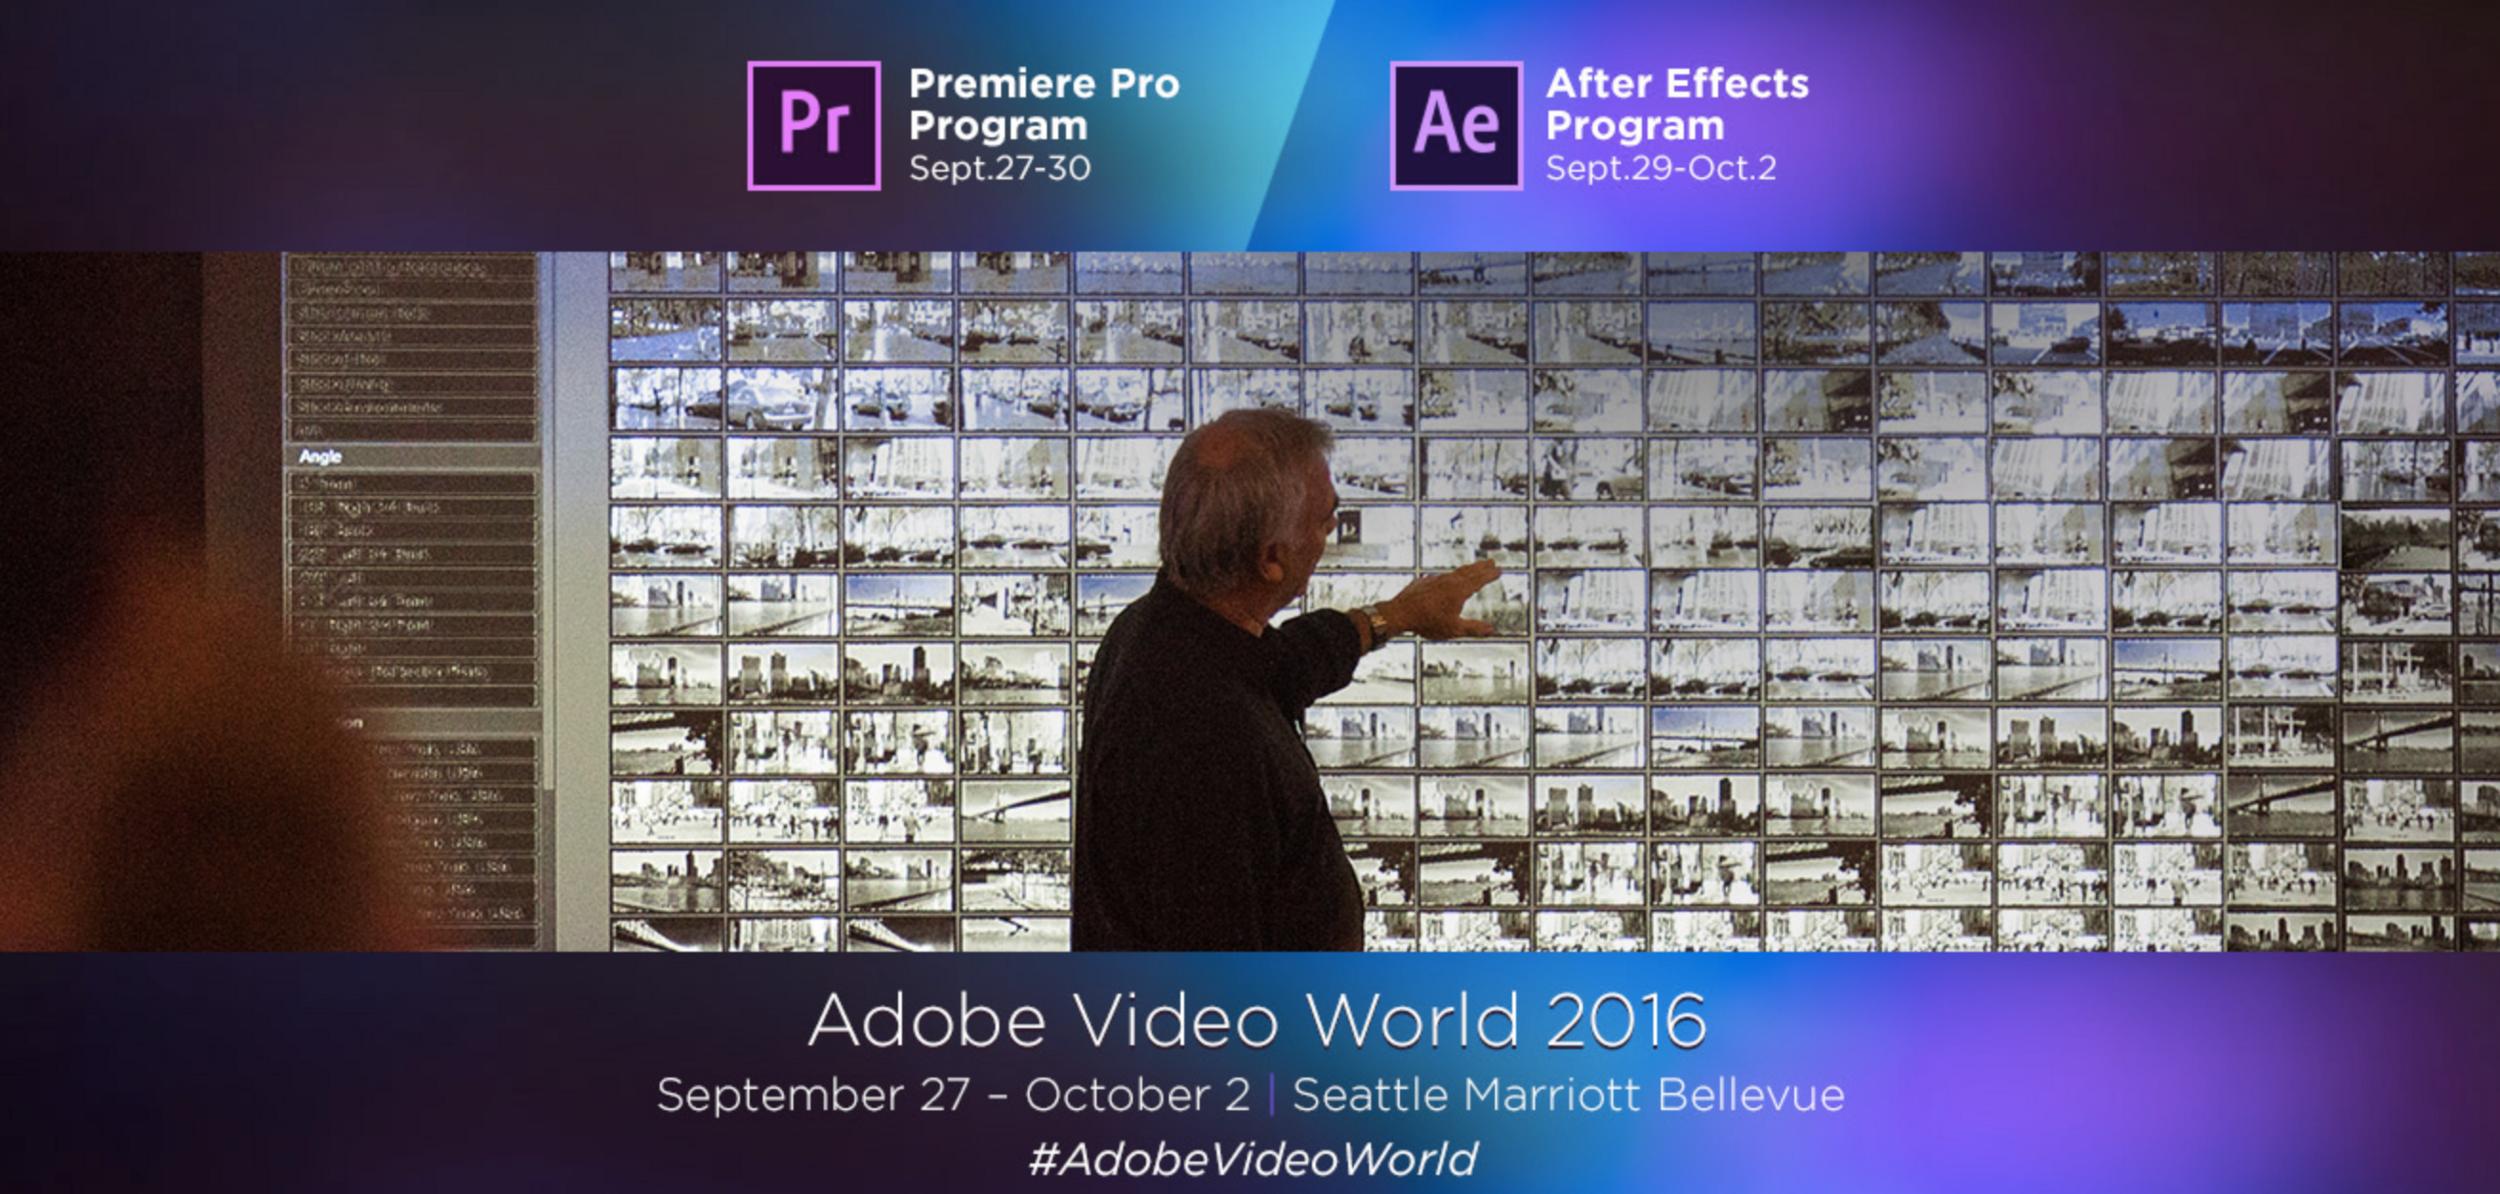 adobe-video-world-2016-promo